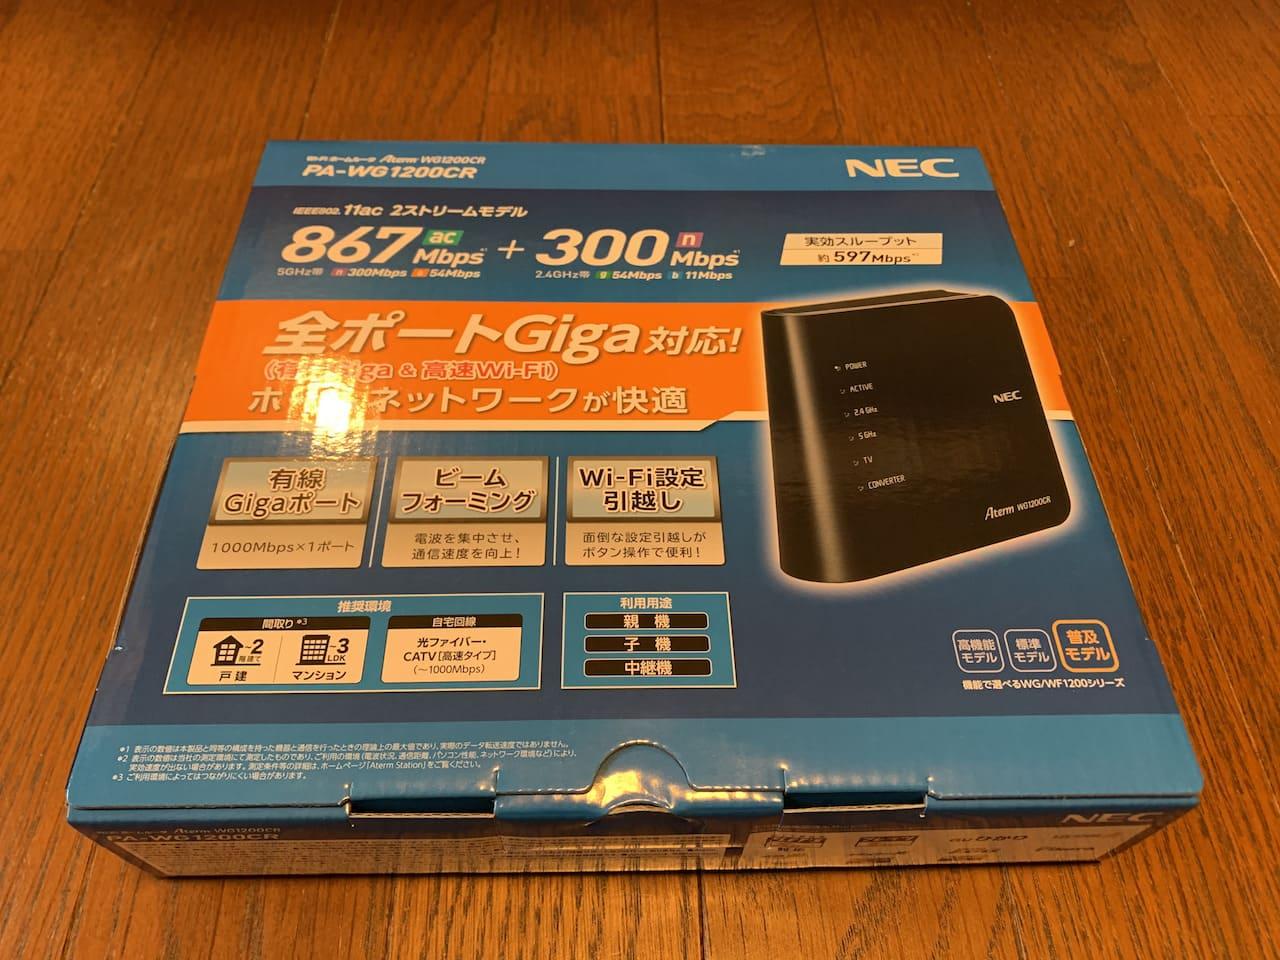 Aterm WG1200CR(PA-WG1200CR)の箱